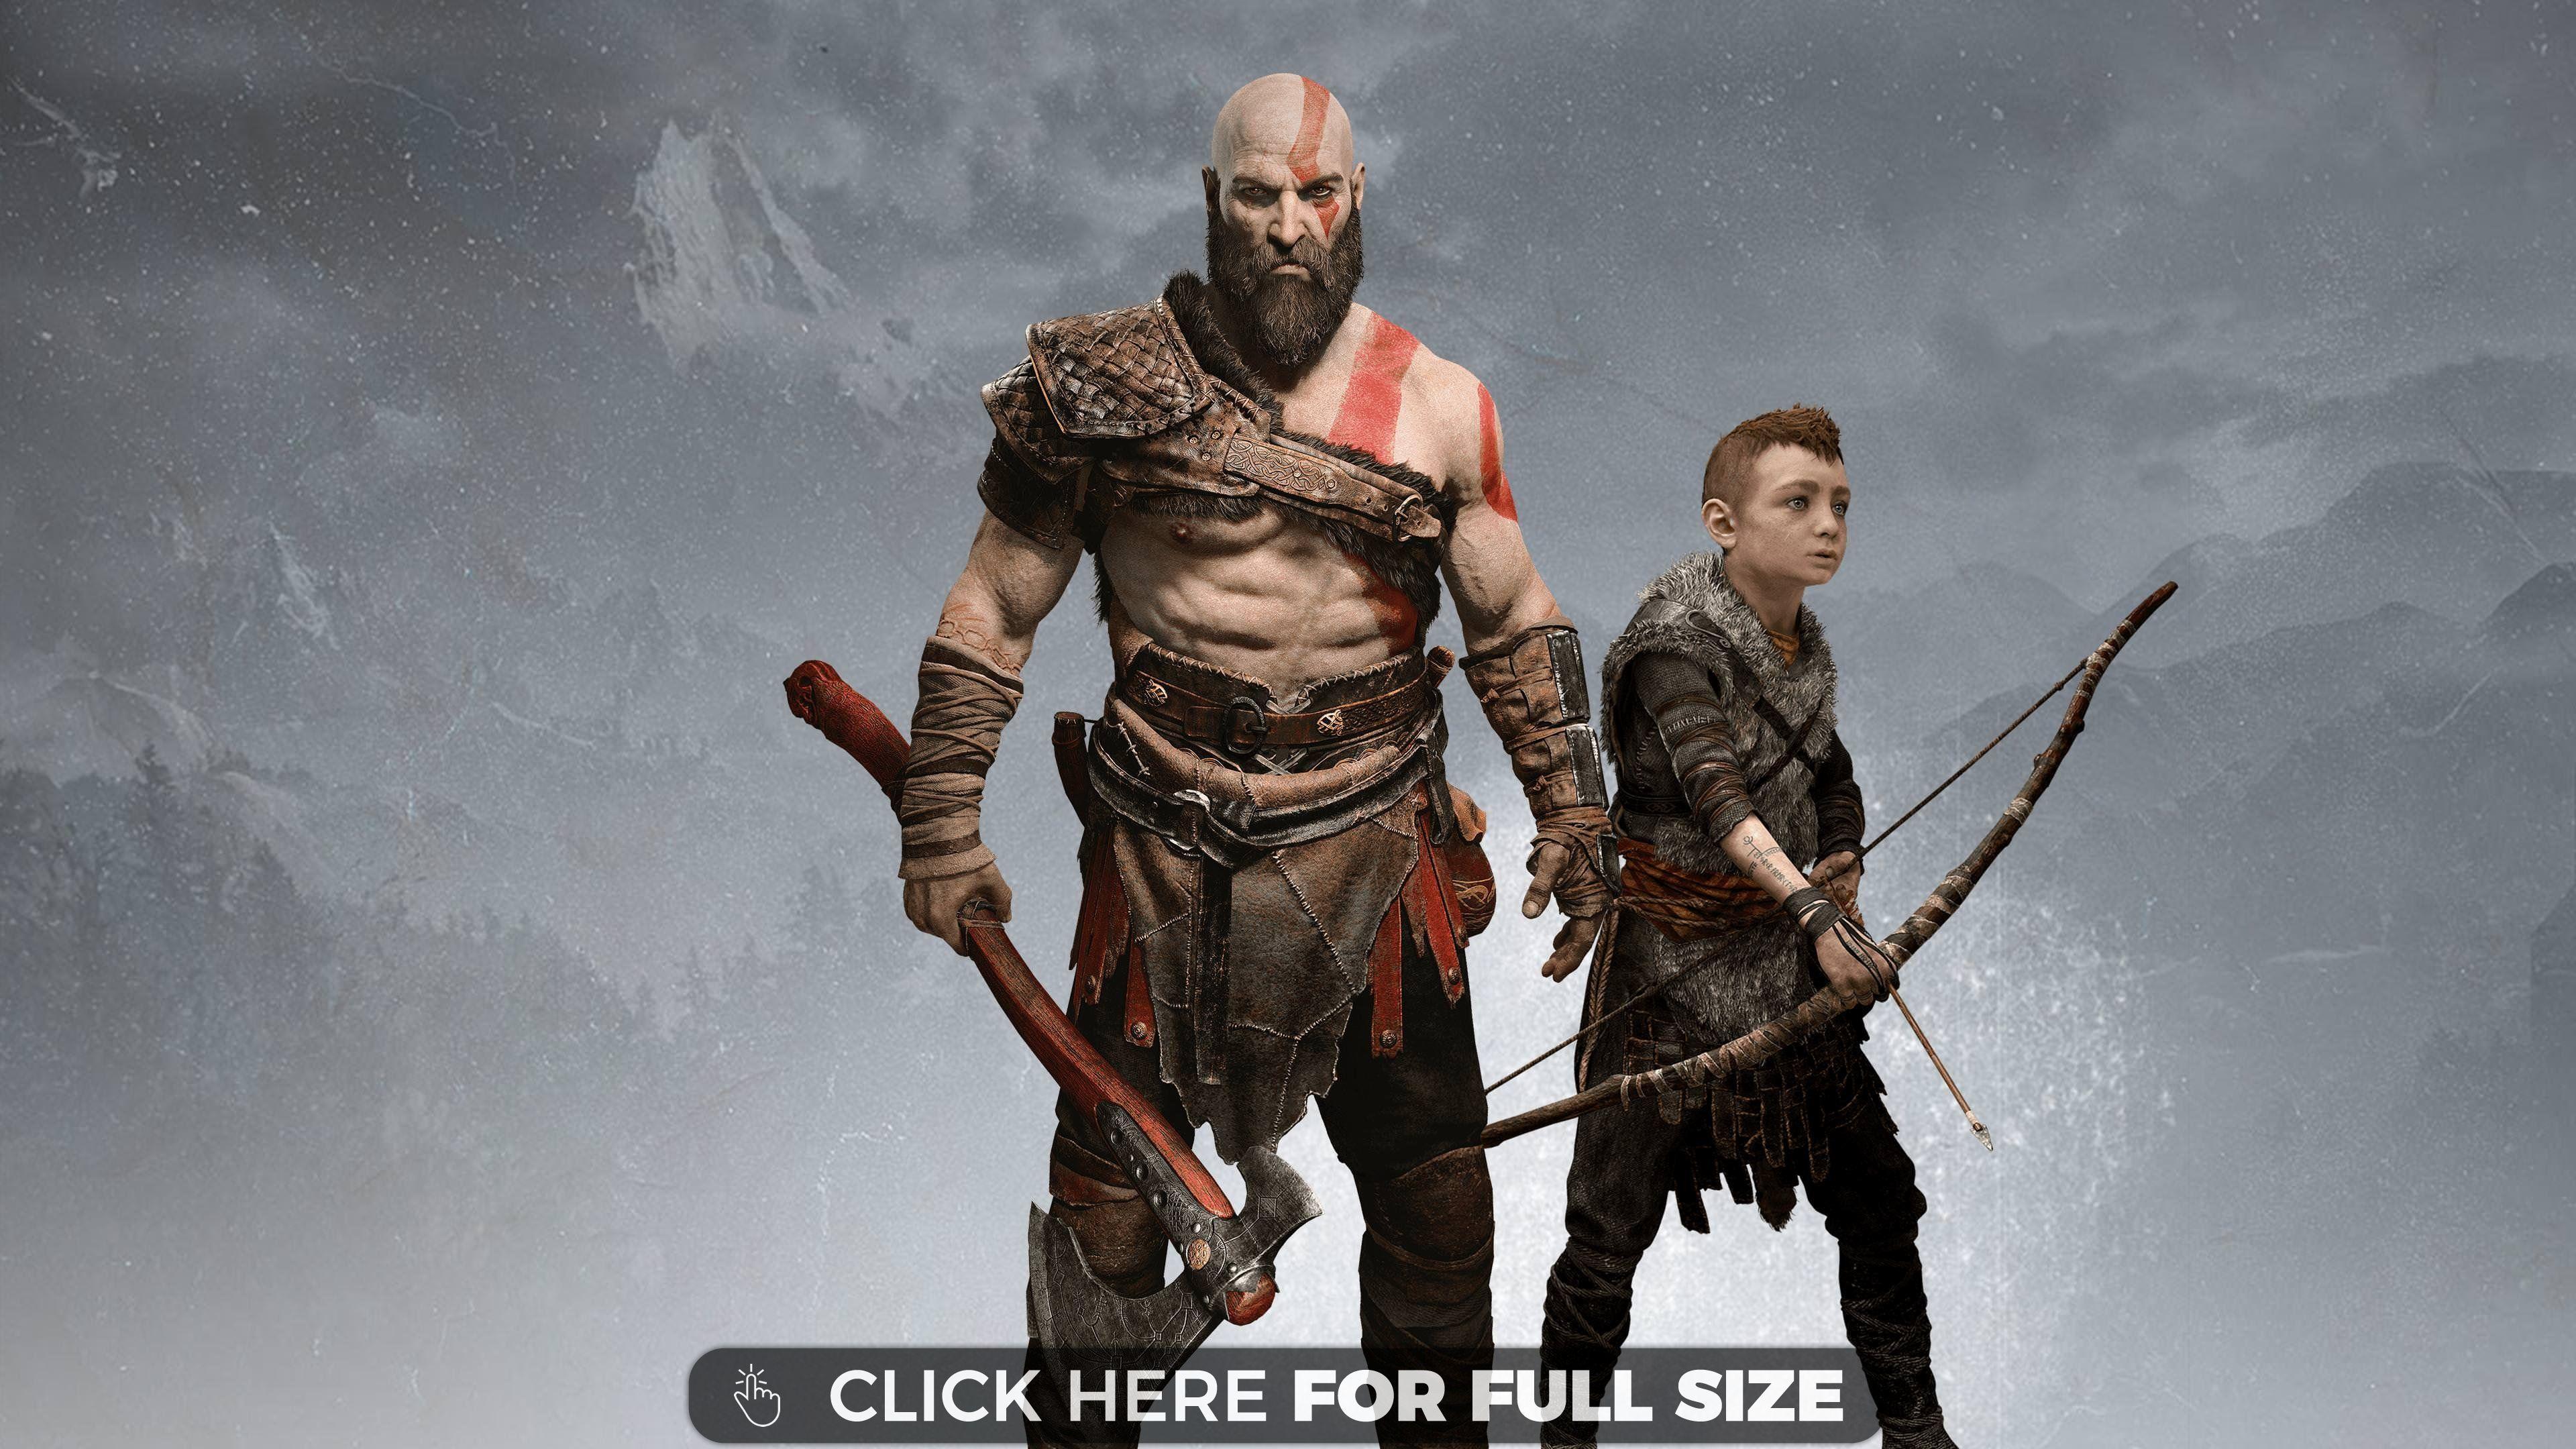 God Of War Ps4 Wallpaper High Definition God Of War Wallpaper 4k Wallpapers For Pc Kratos Wallpaper